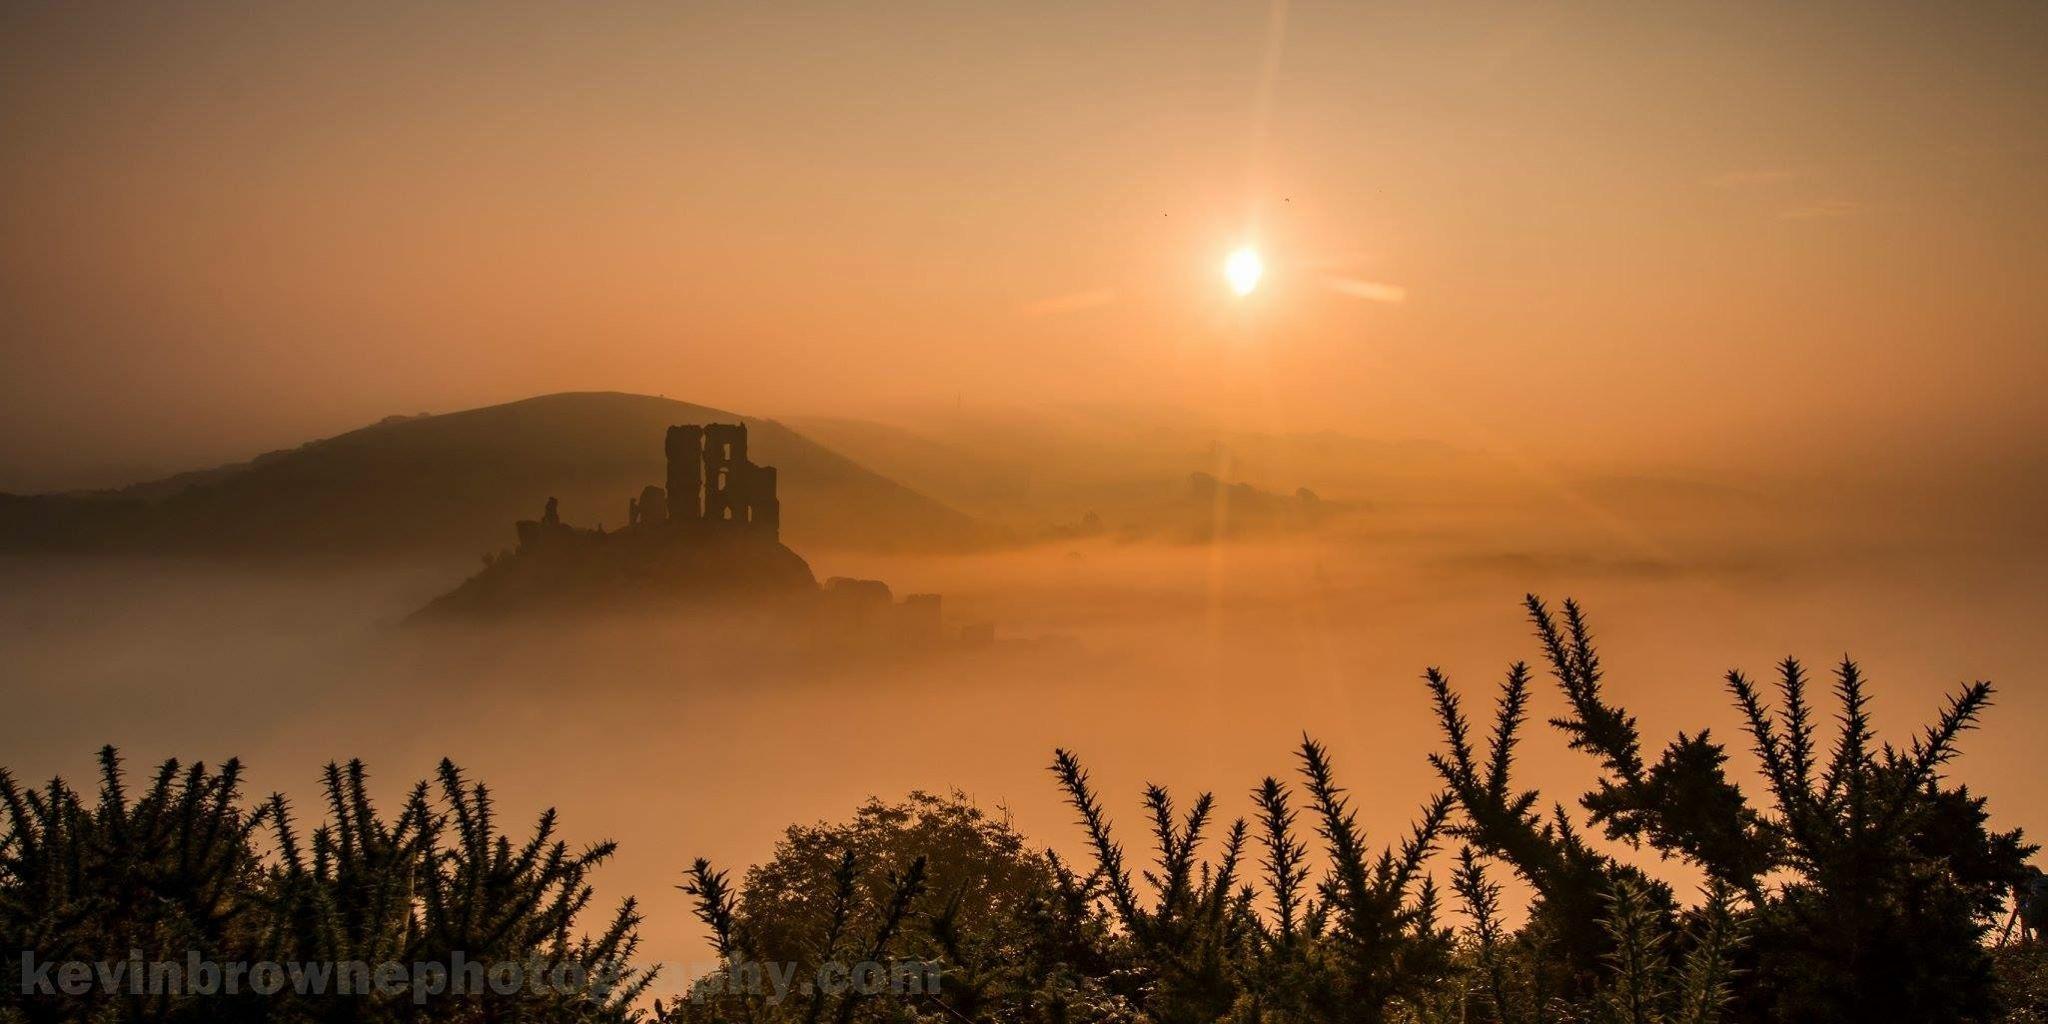 Misty Sunrise at Corfe Castle by KevinBrownePhotography